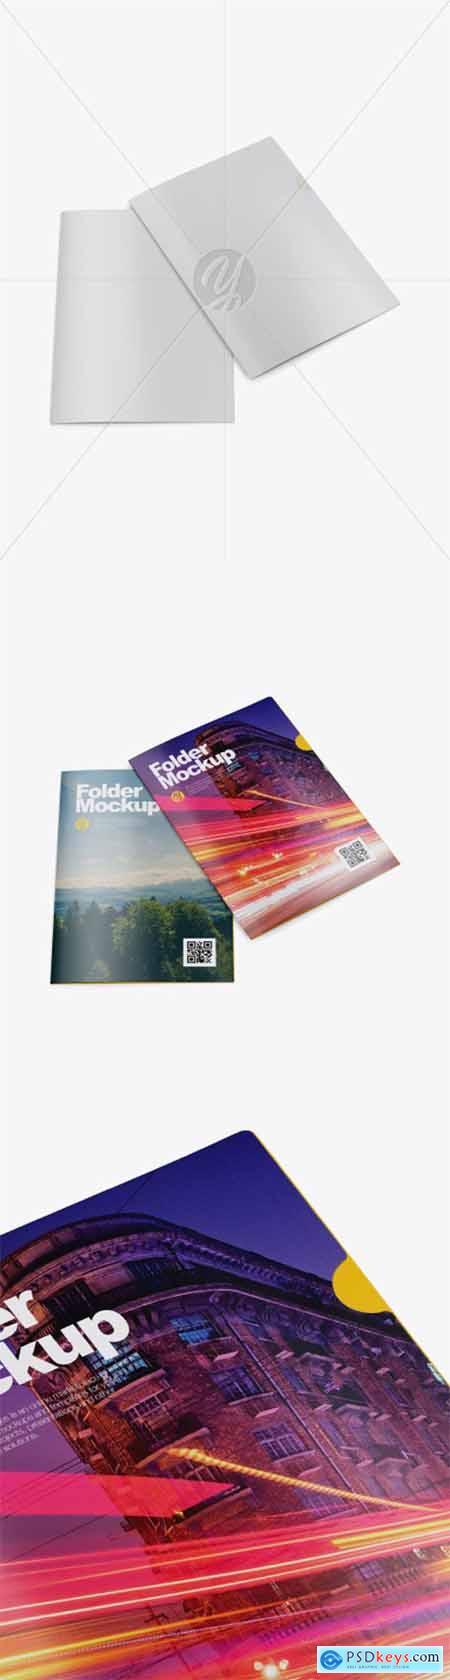 Two Folders Mockup - High-Angle Shot 28595